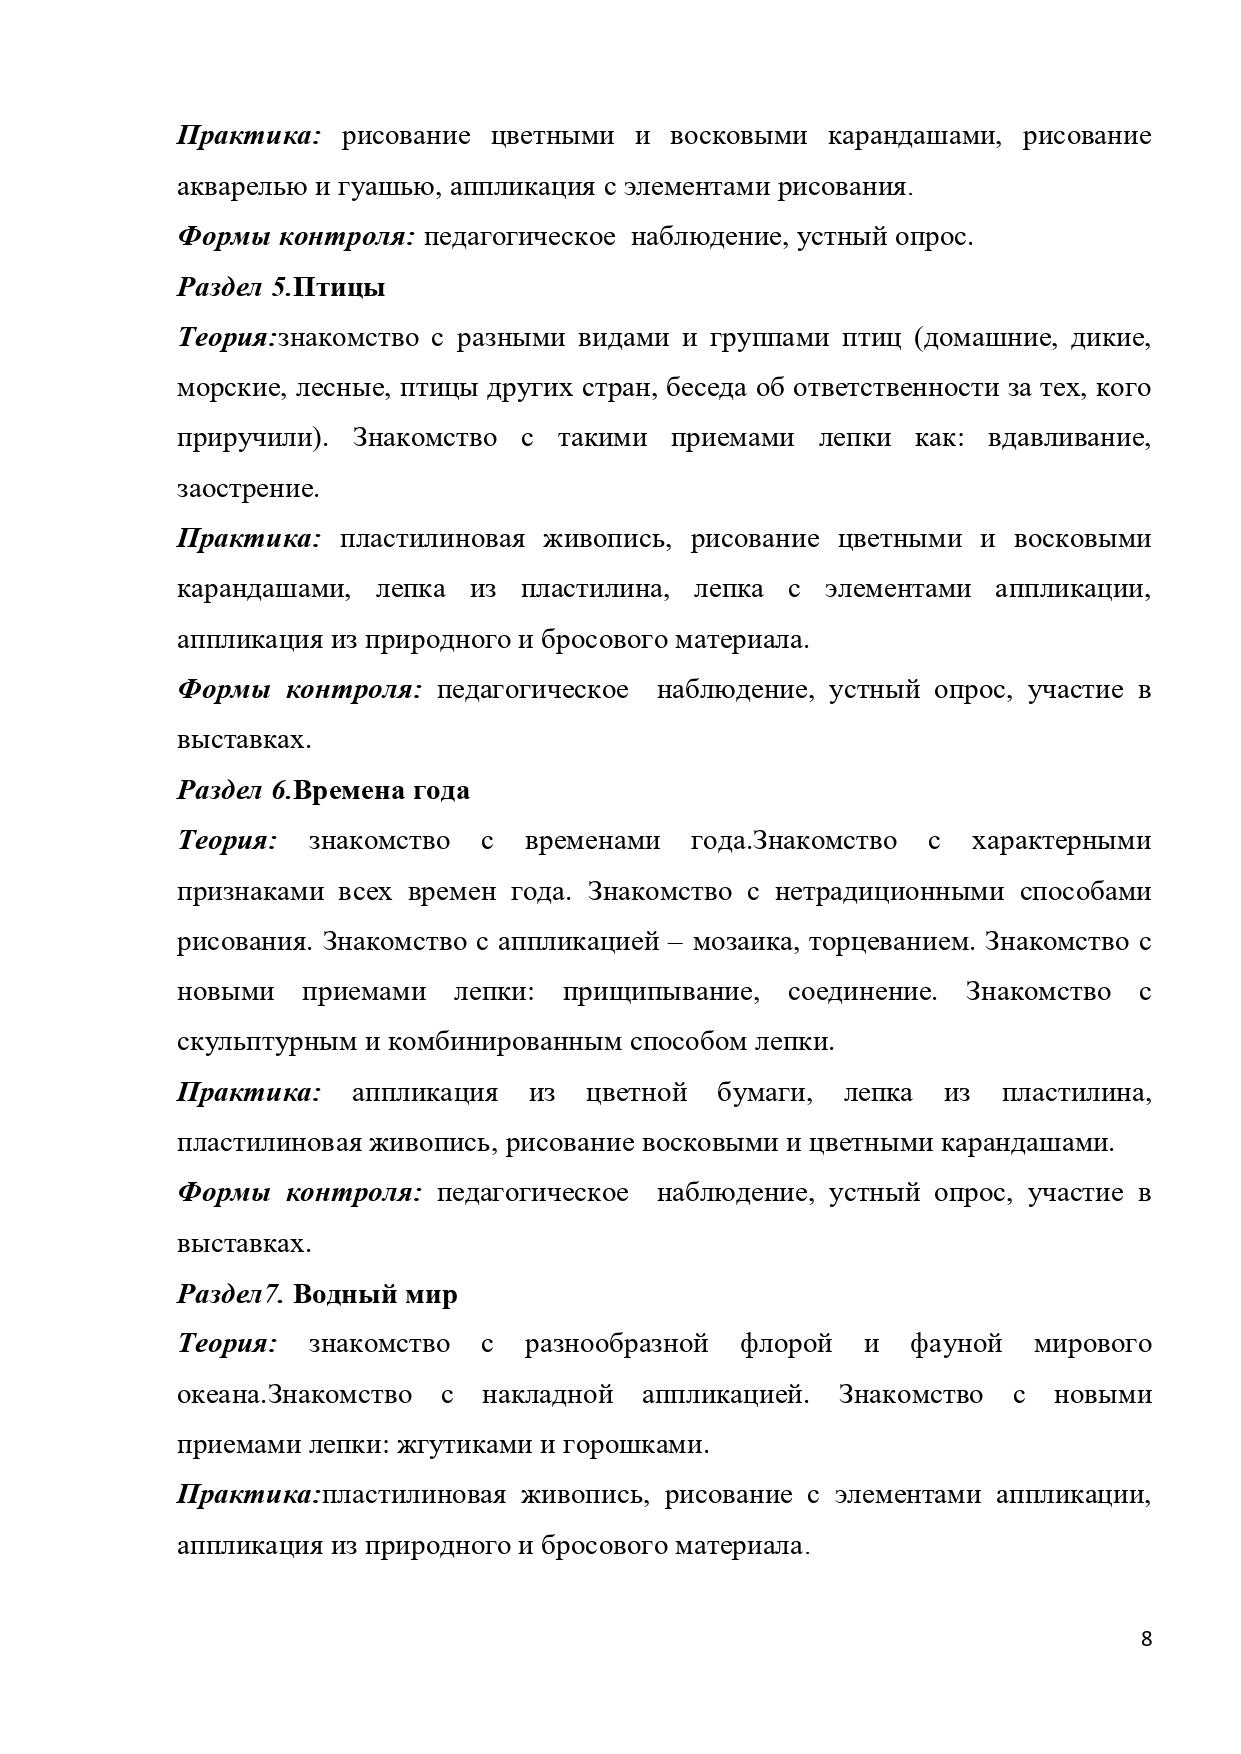 ДООП От познания к творчеству_pages-to-jpg-0008